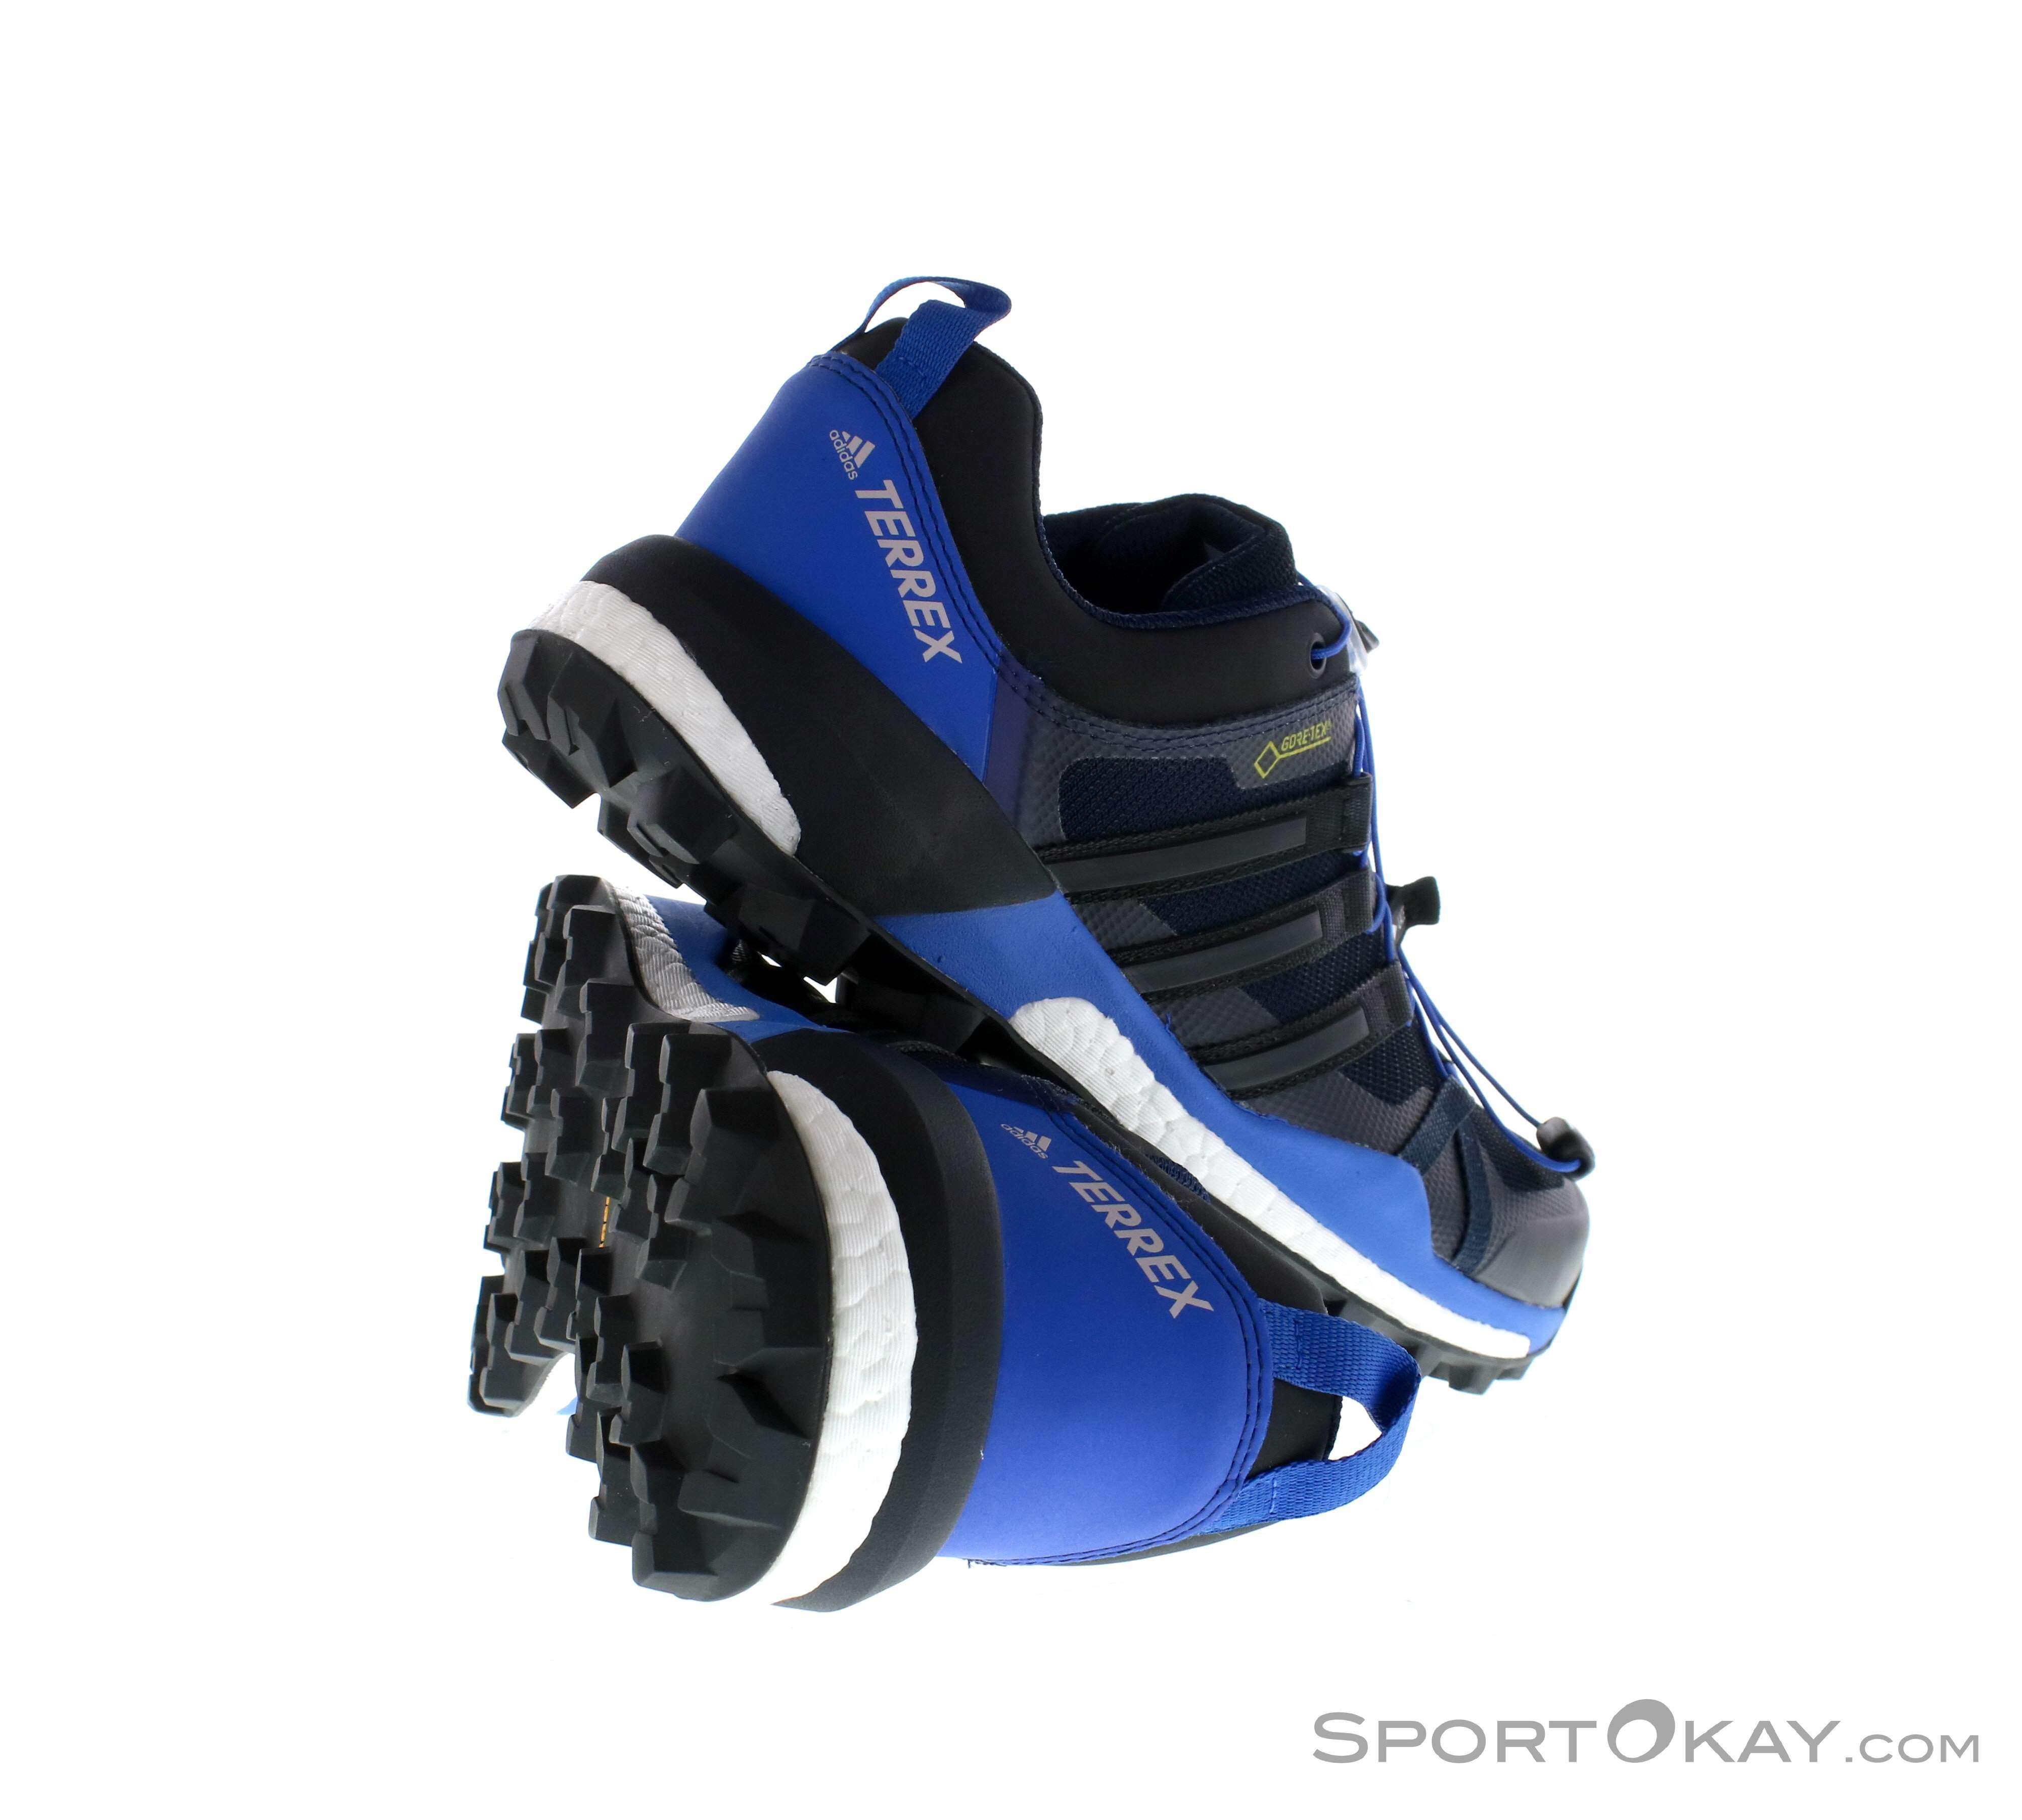 Adidas Terrex Gore - Tex skychaser GTX hombre  zapatos de trekking trekking